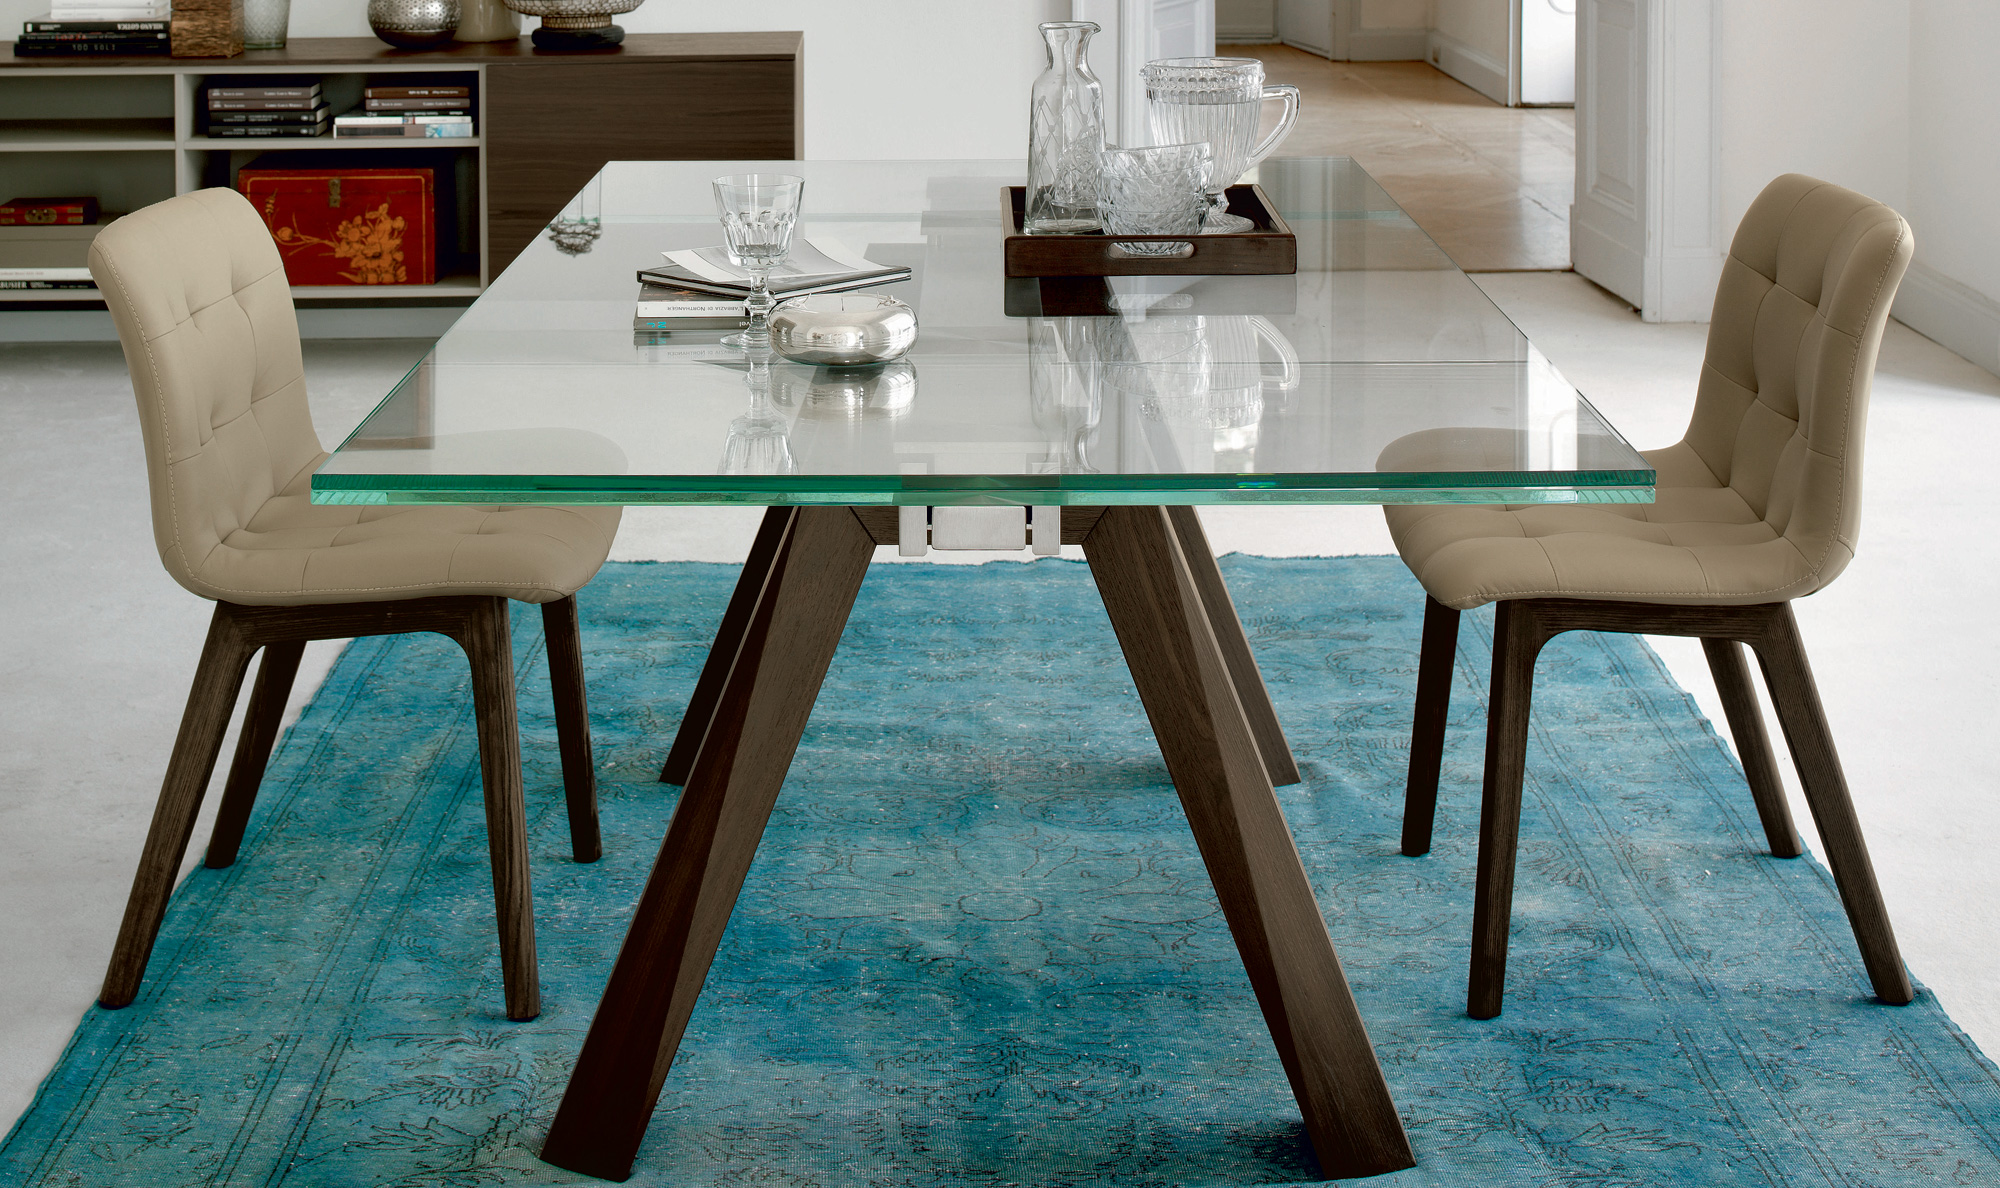 folding chair lulu office mats for carpet bontempi kuga 40 37